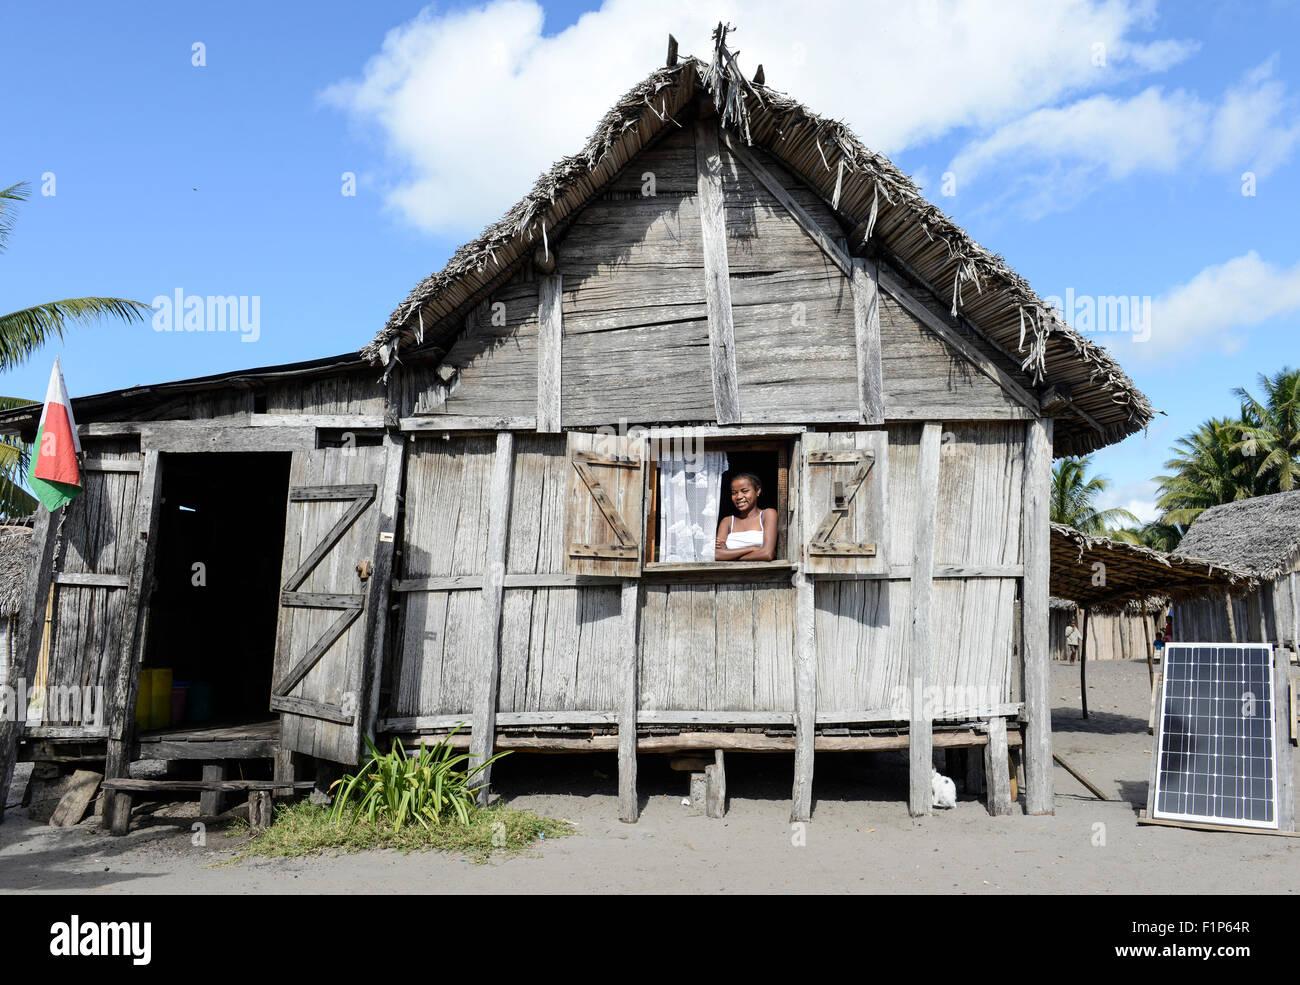 MADAGASCAR, Mananjary region, village AMBOHITSARA, hut with solar home system - Stock Image